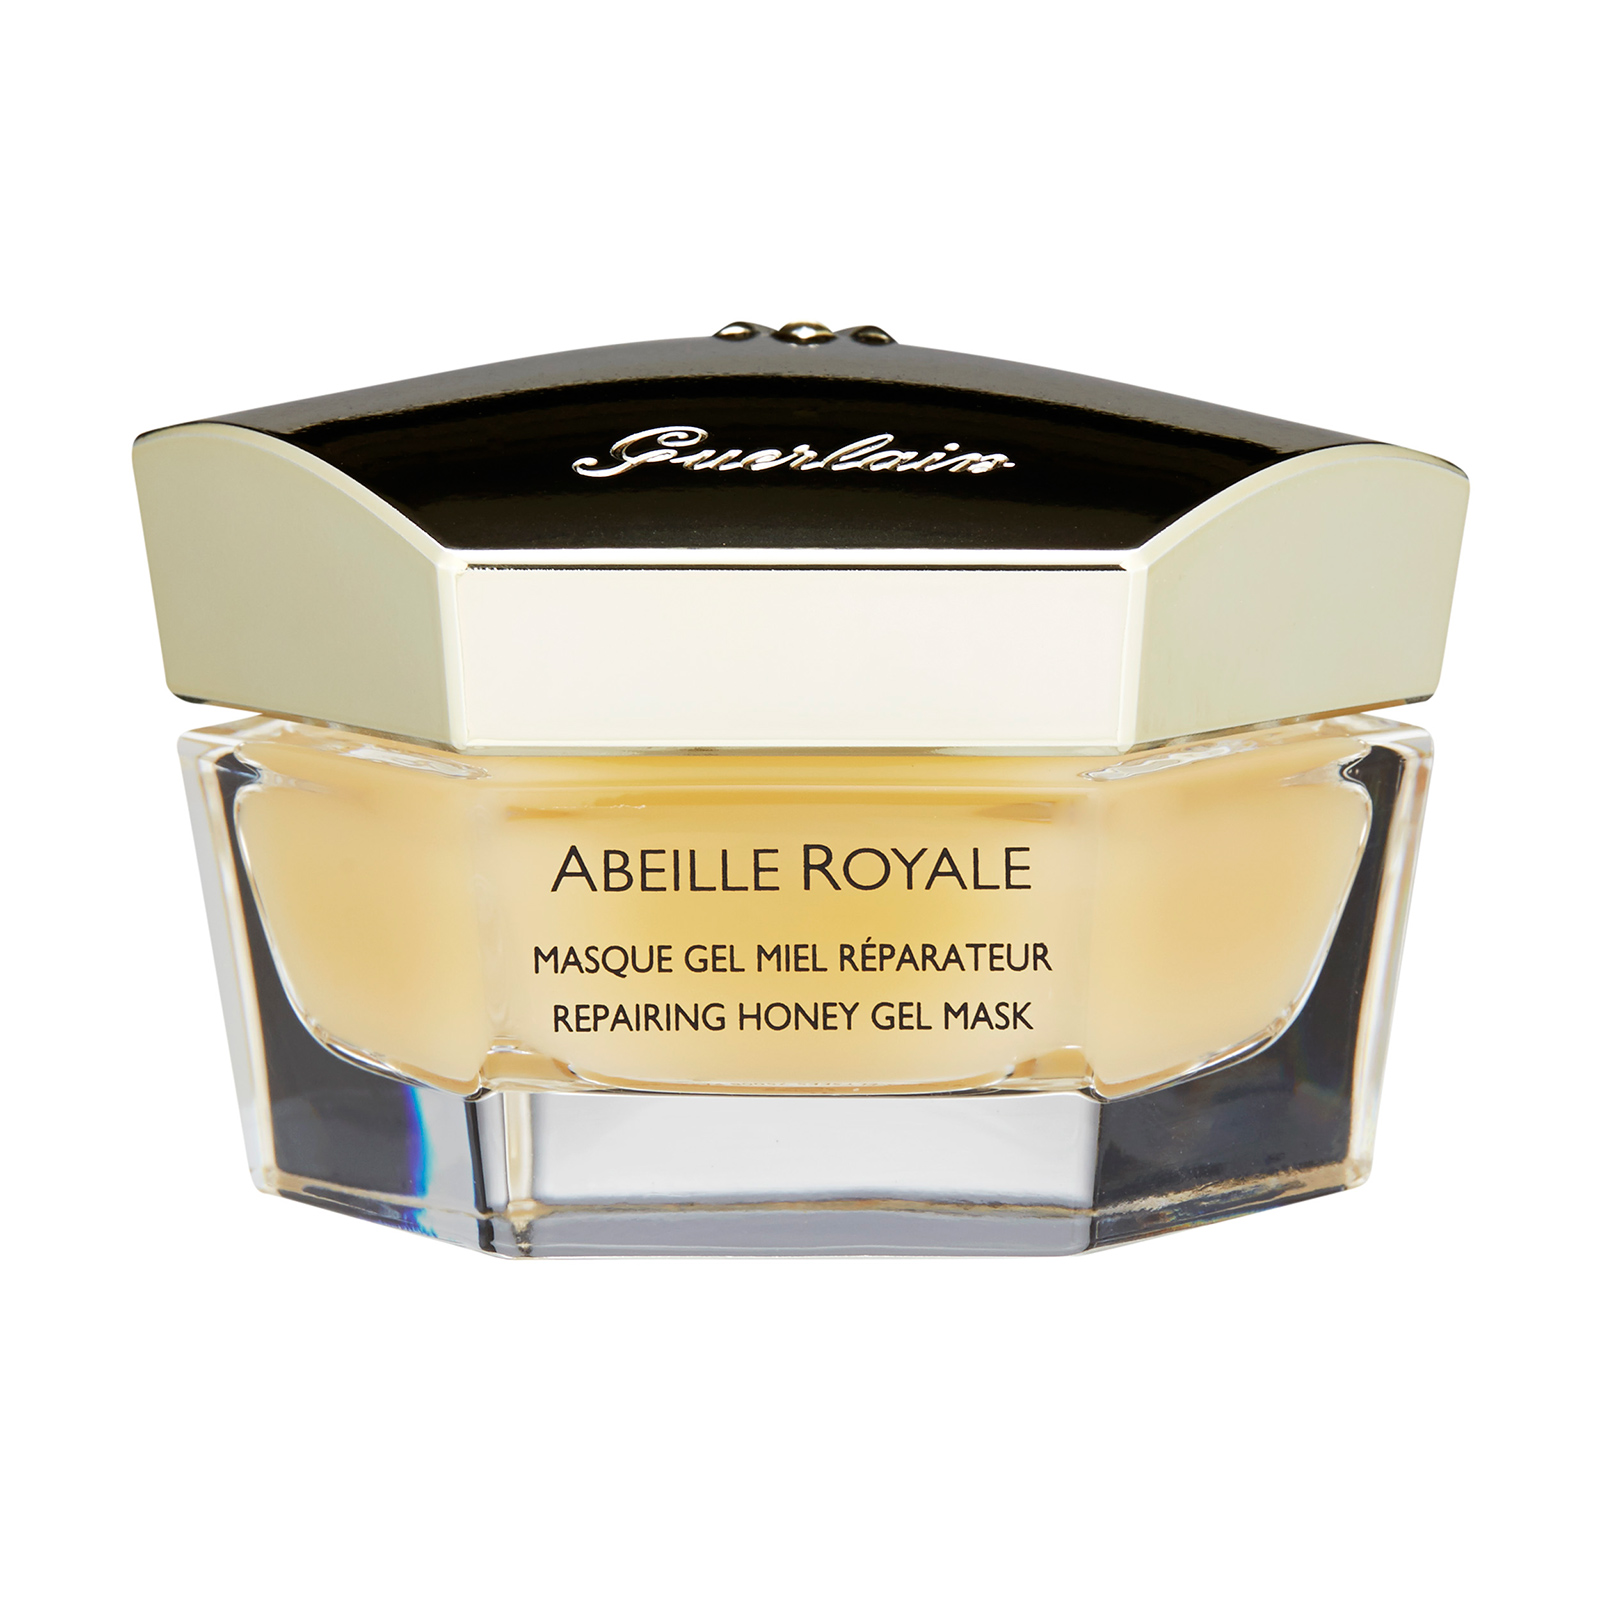 Guerlain Abeille Royale  Repairing Honey Gel Mask 50ml, from Cosme-De.com